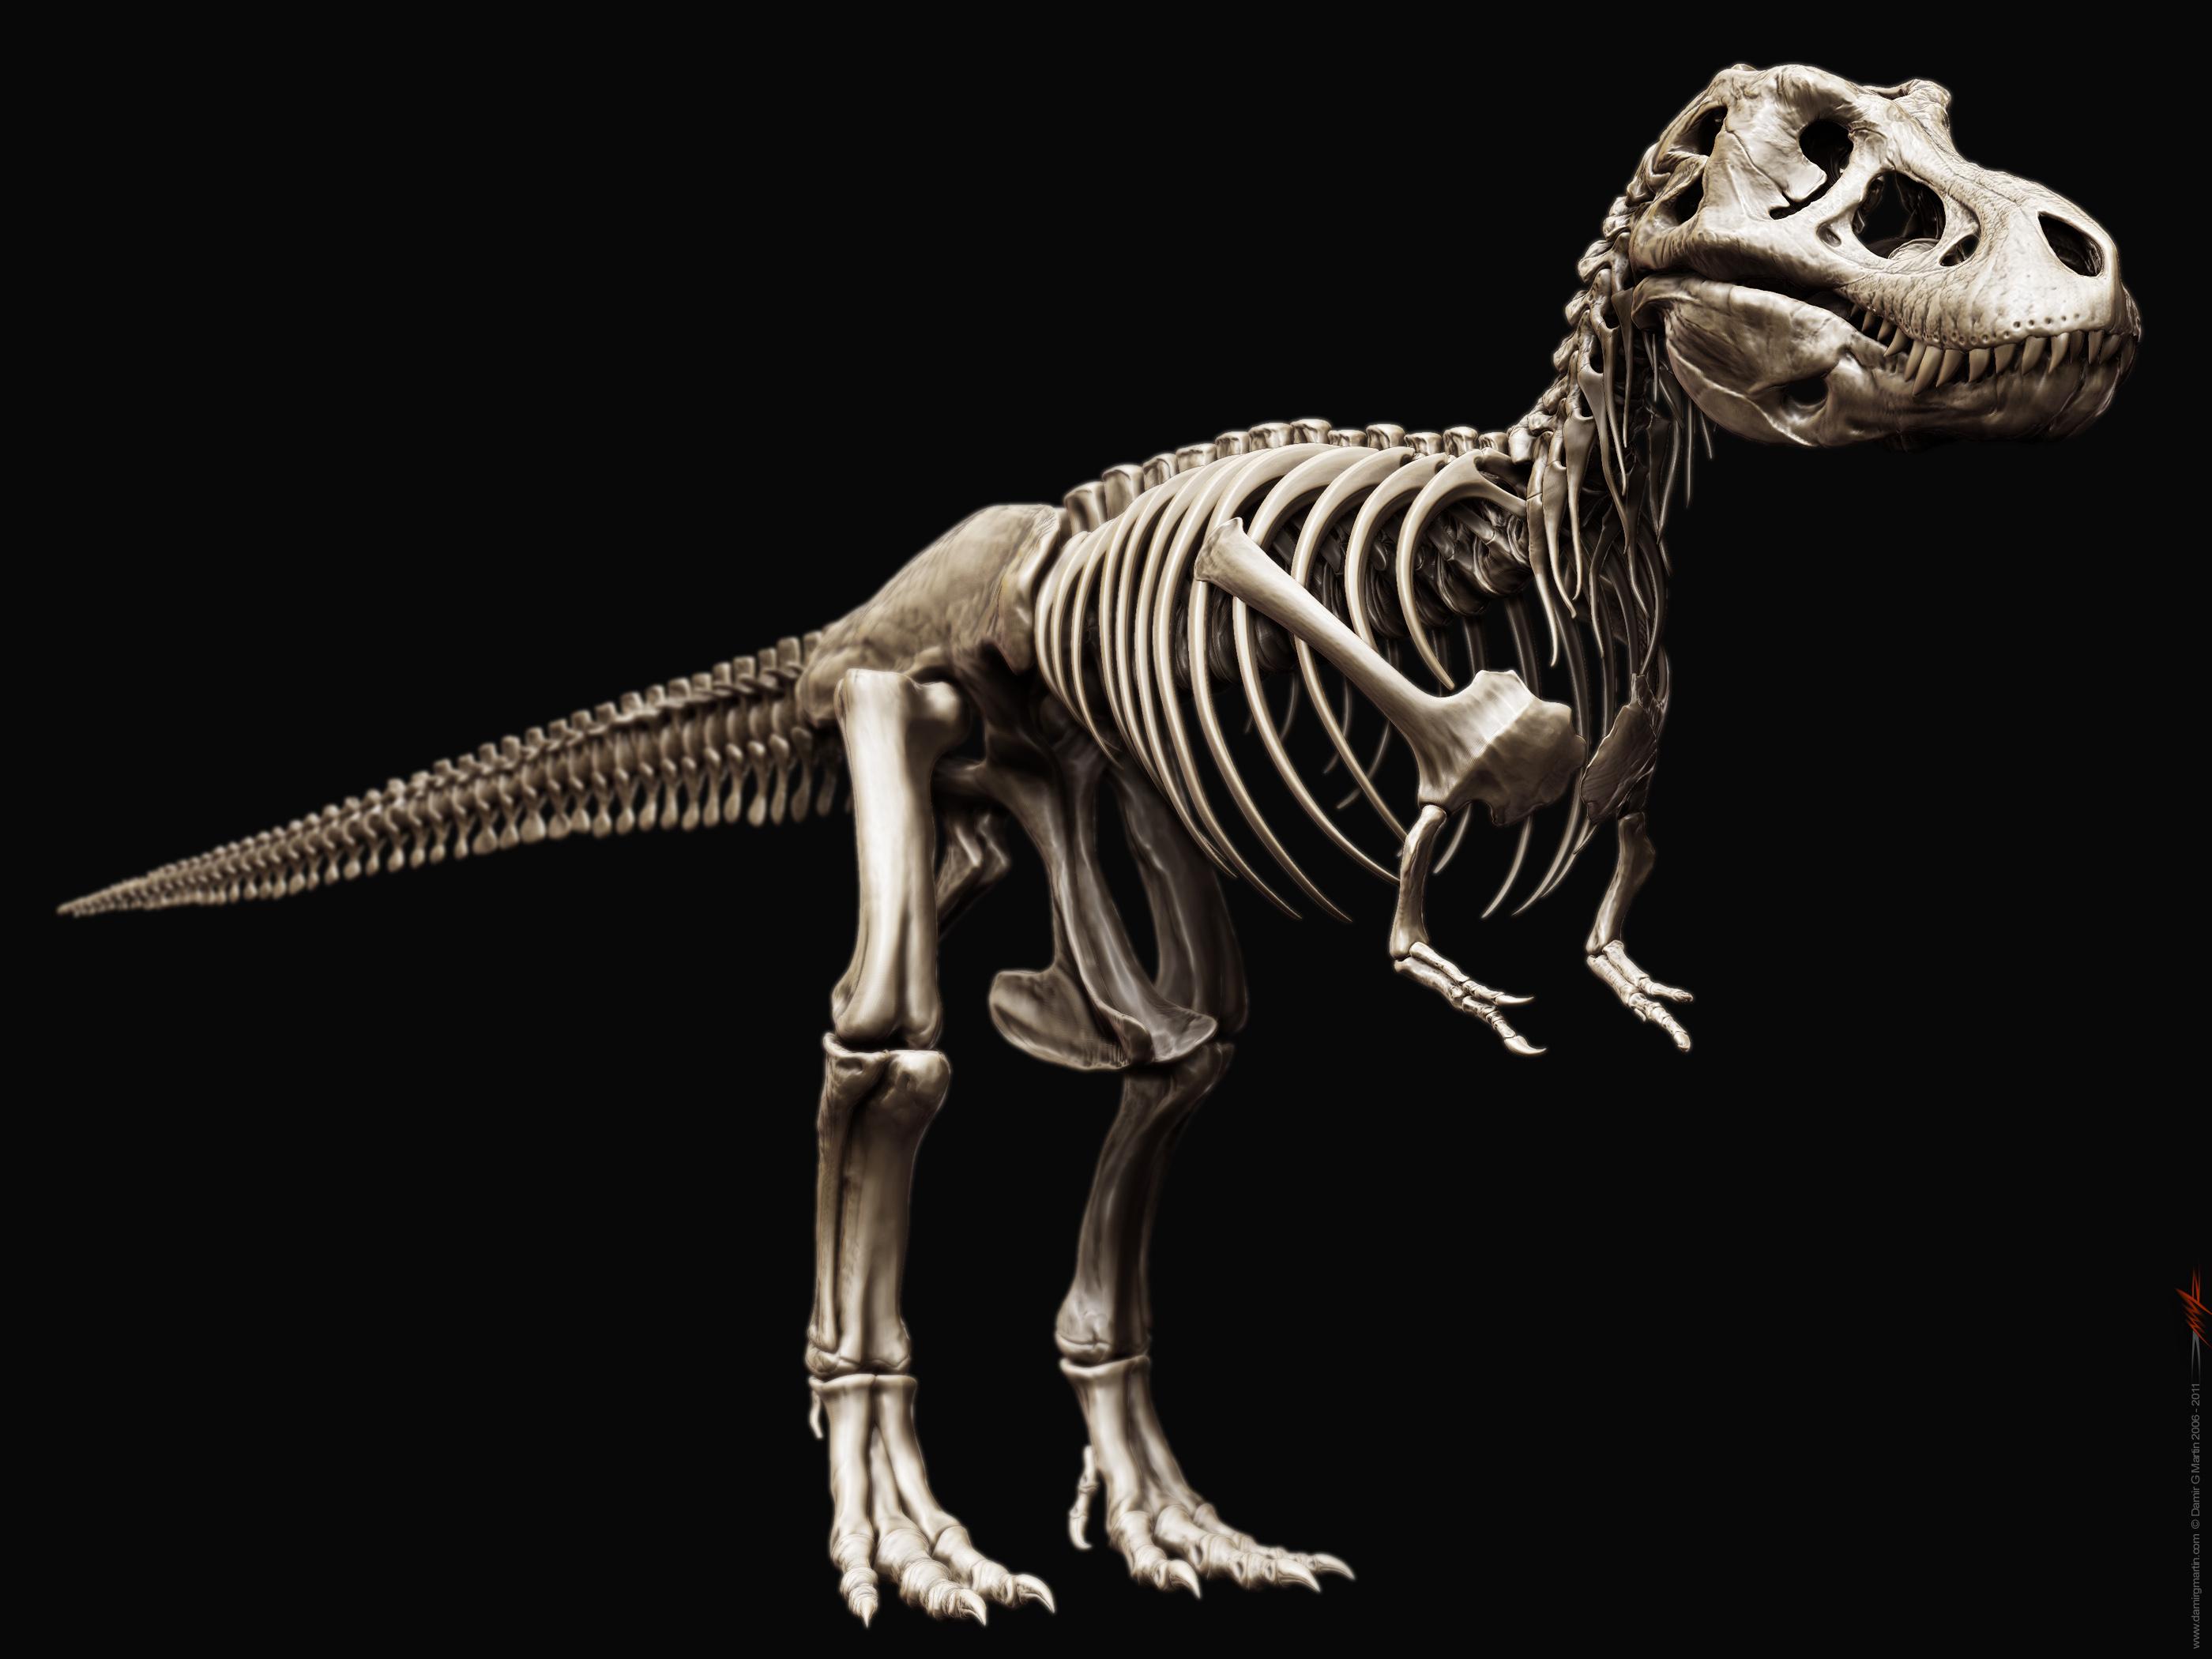 Tyrannosaurus Rex Skeleton by damir-g-martin on DeviantArt